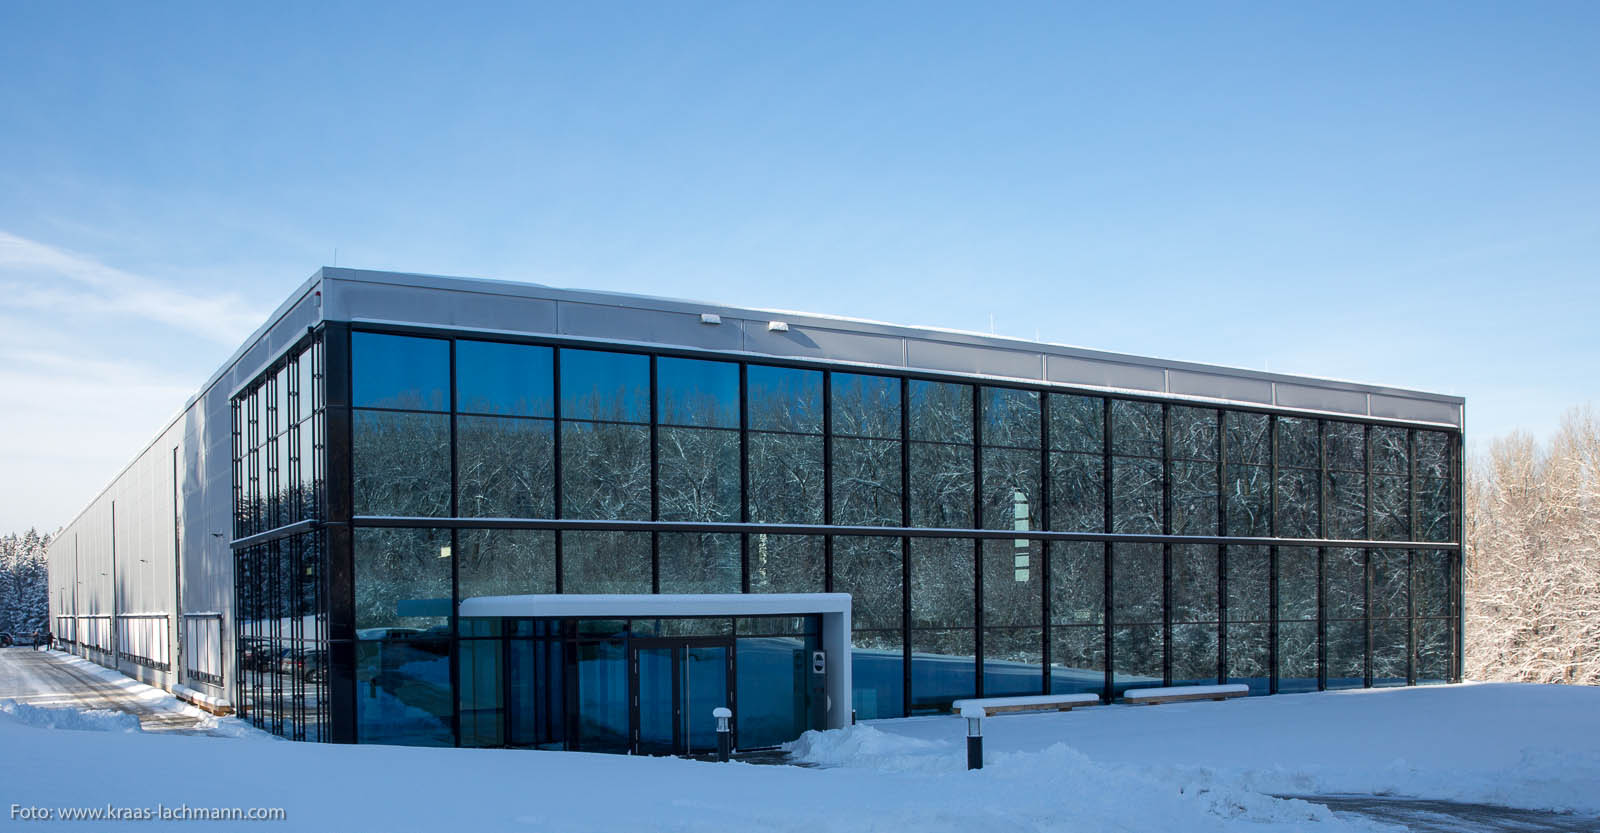 Firmensitz der Haas Schleifmaschinen GmbH in Trossingen.